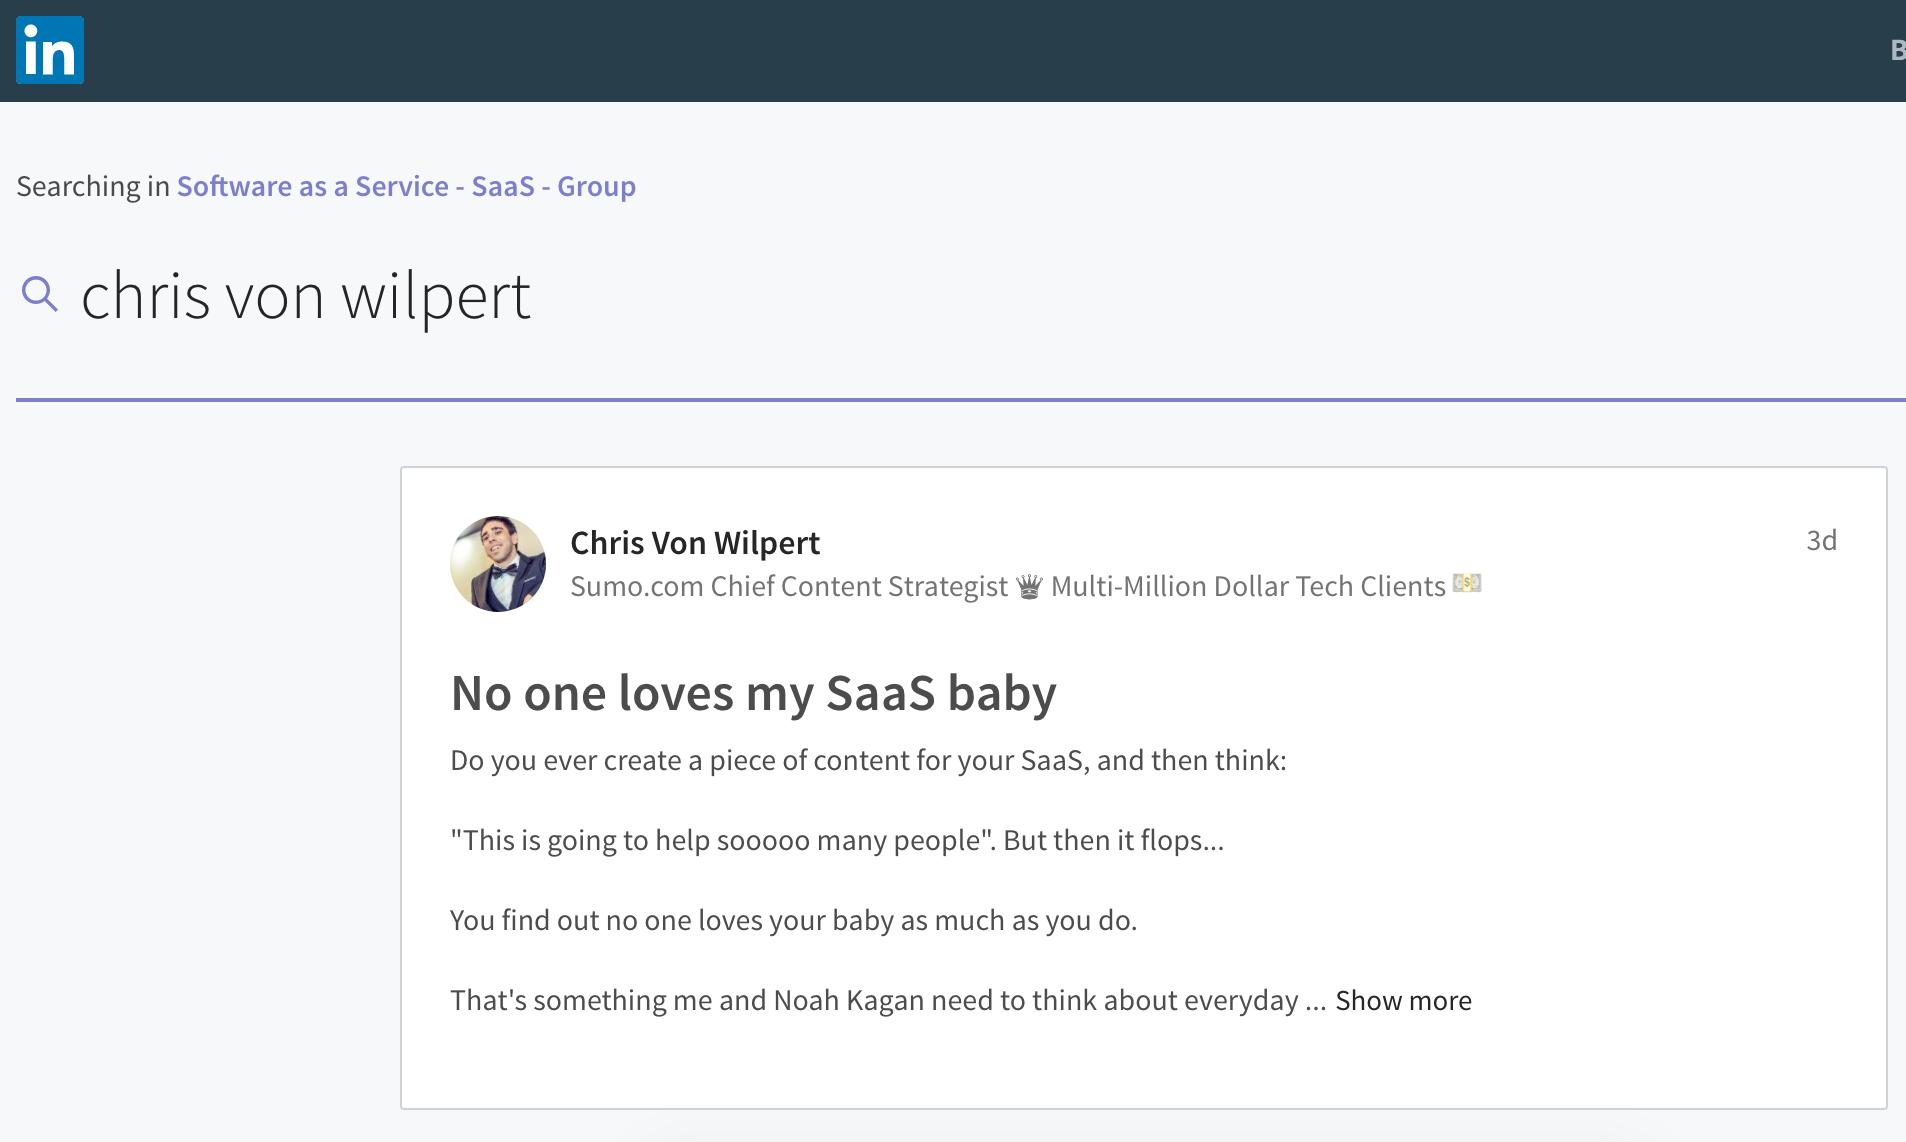 Screenshot of a search for Chris Von Wilpert on LinkedIn